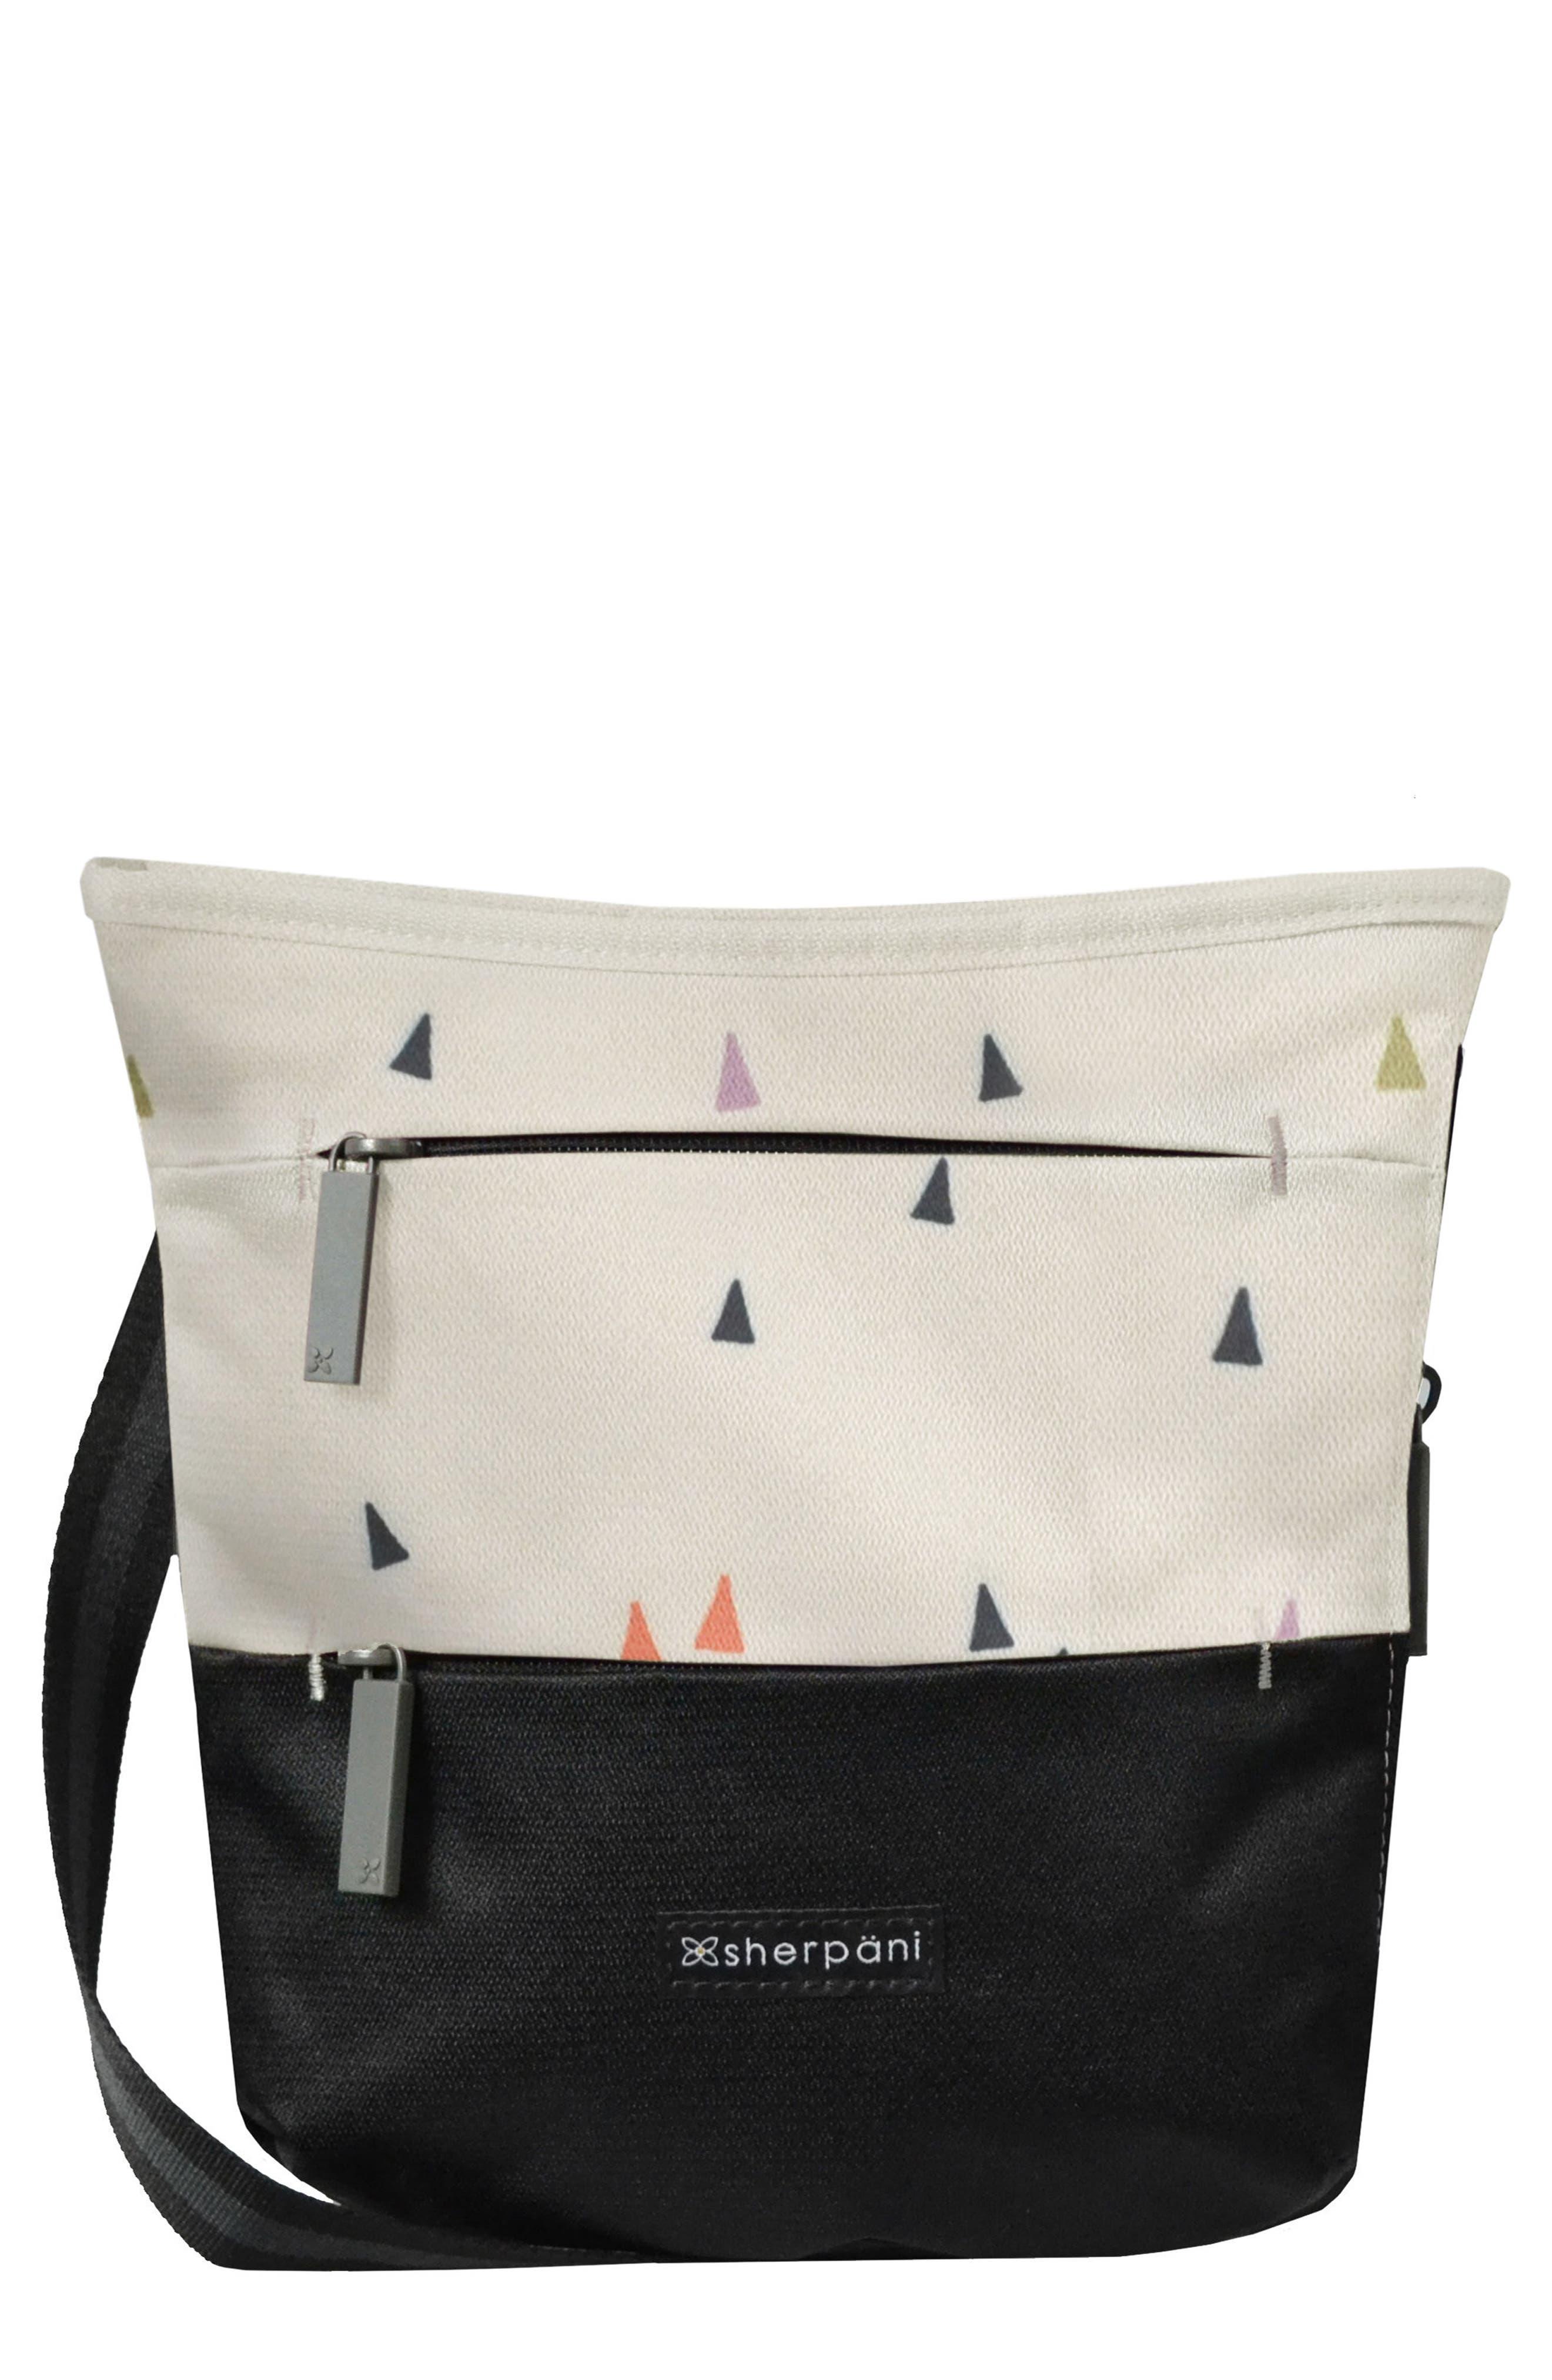 SHERPANI Medium Sadie Crossbody Bag